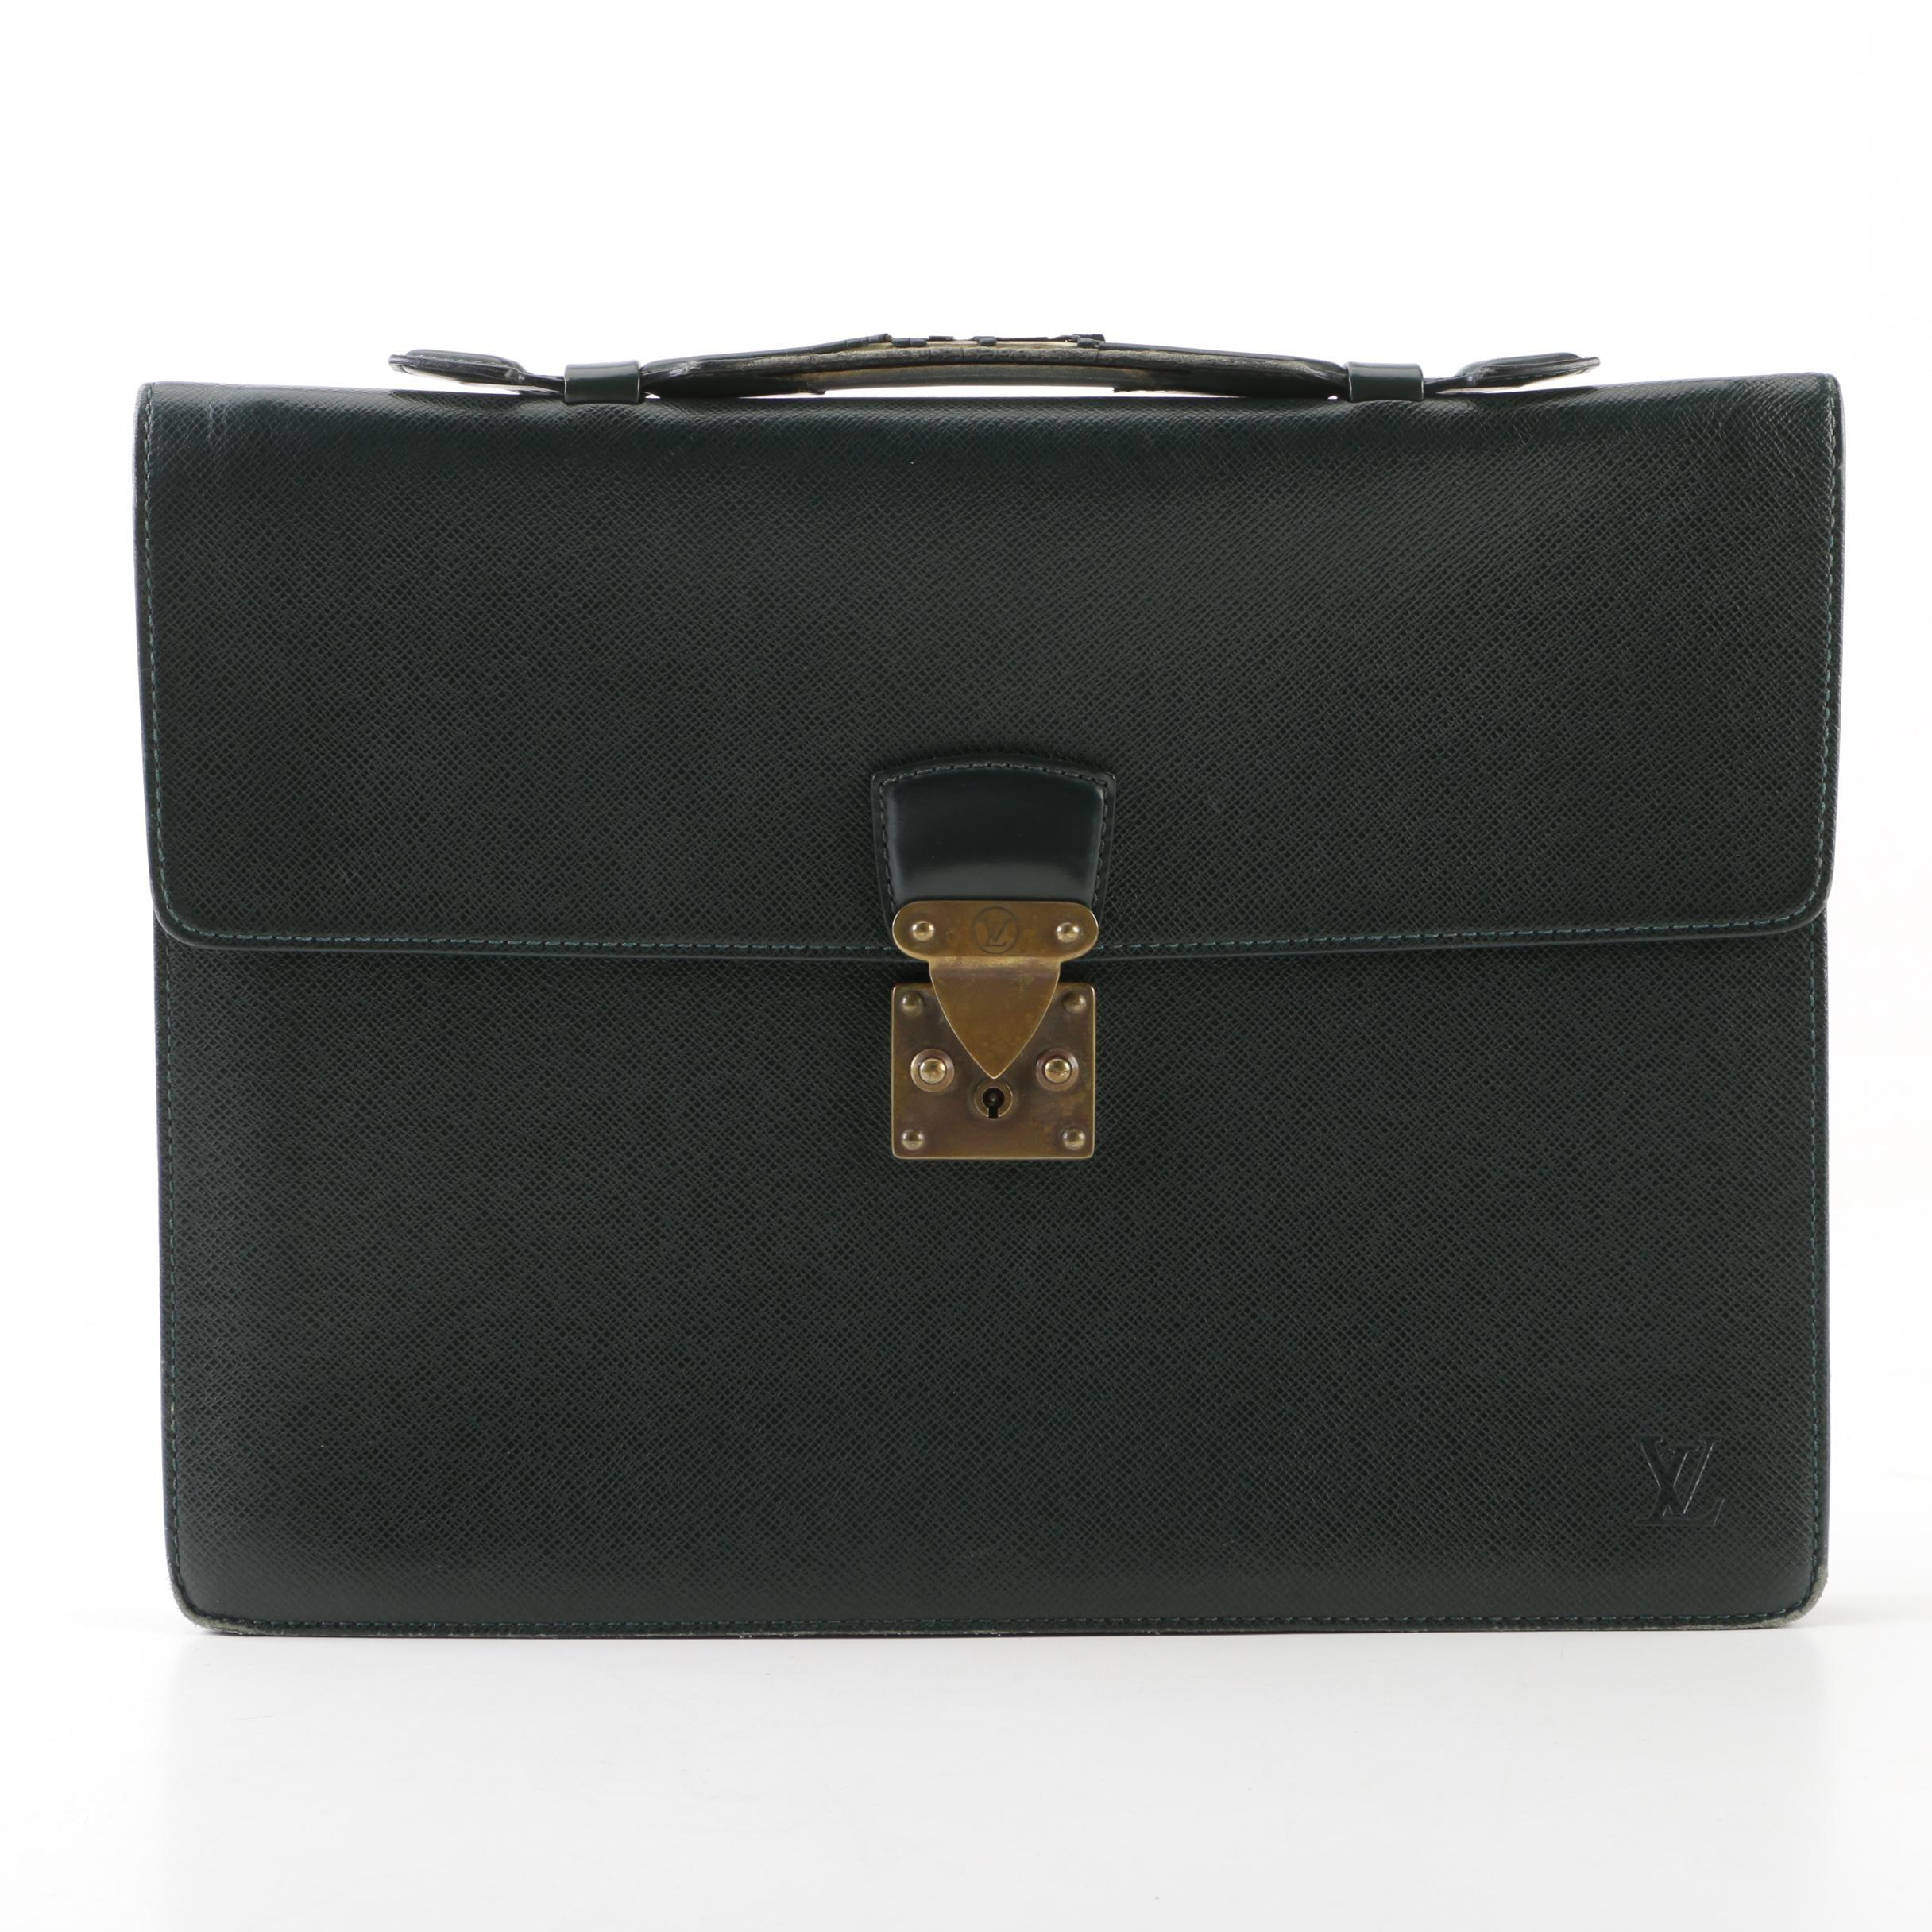 1994 Vintage Louis Vuitton Paris Green Taiga Leather Kourad Ambassador Serviette